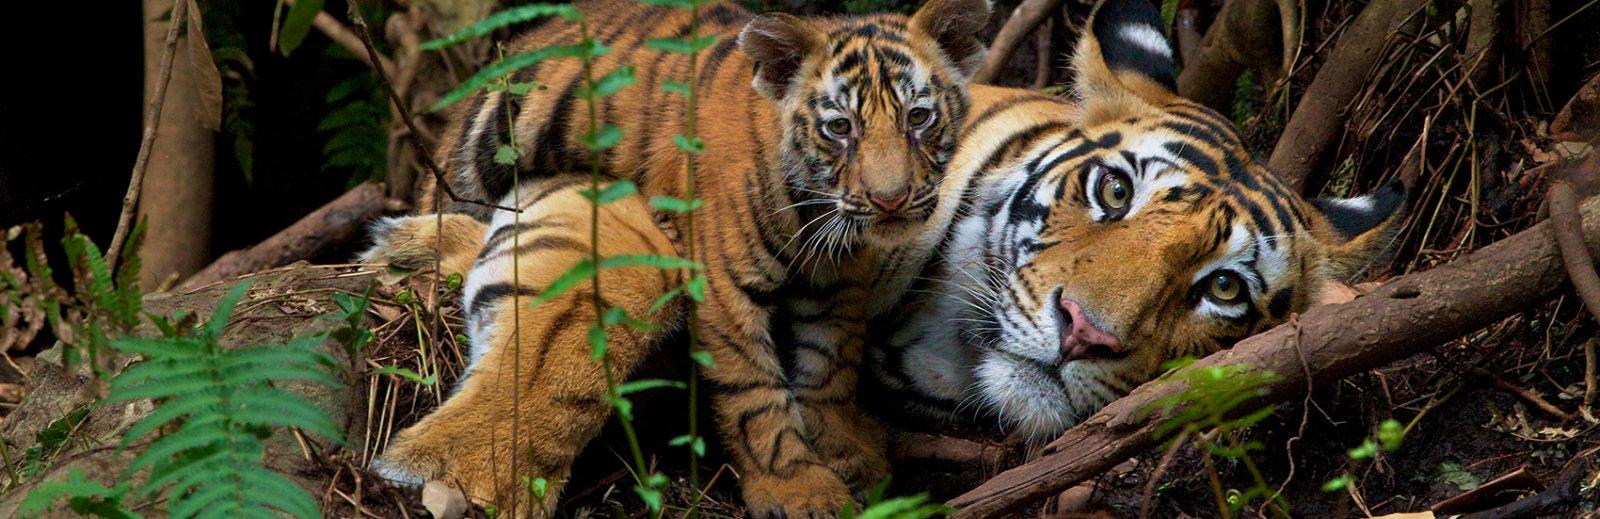 Name:  Tigers-Wide_1700x550.jpg Views: 58 Size:  212.1 KB